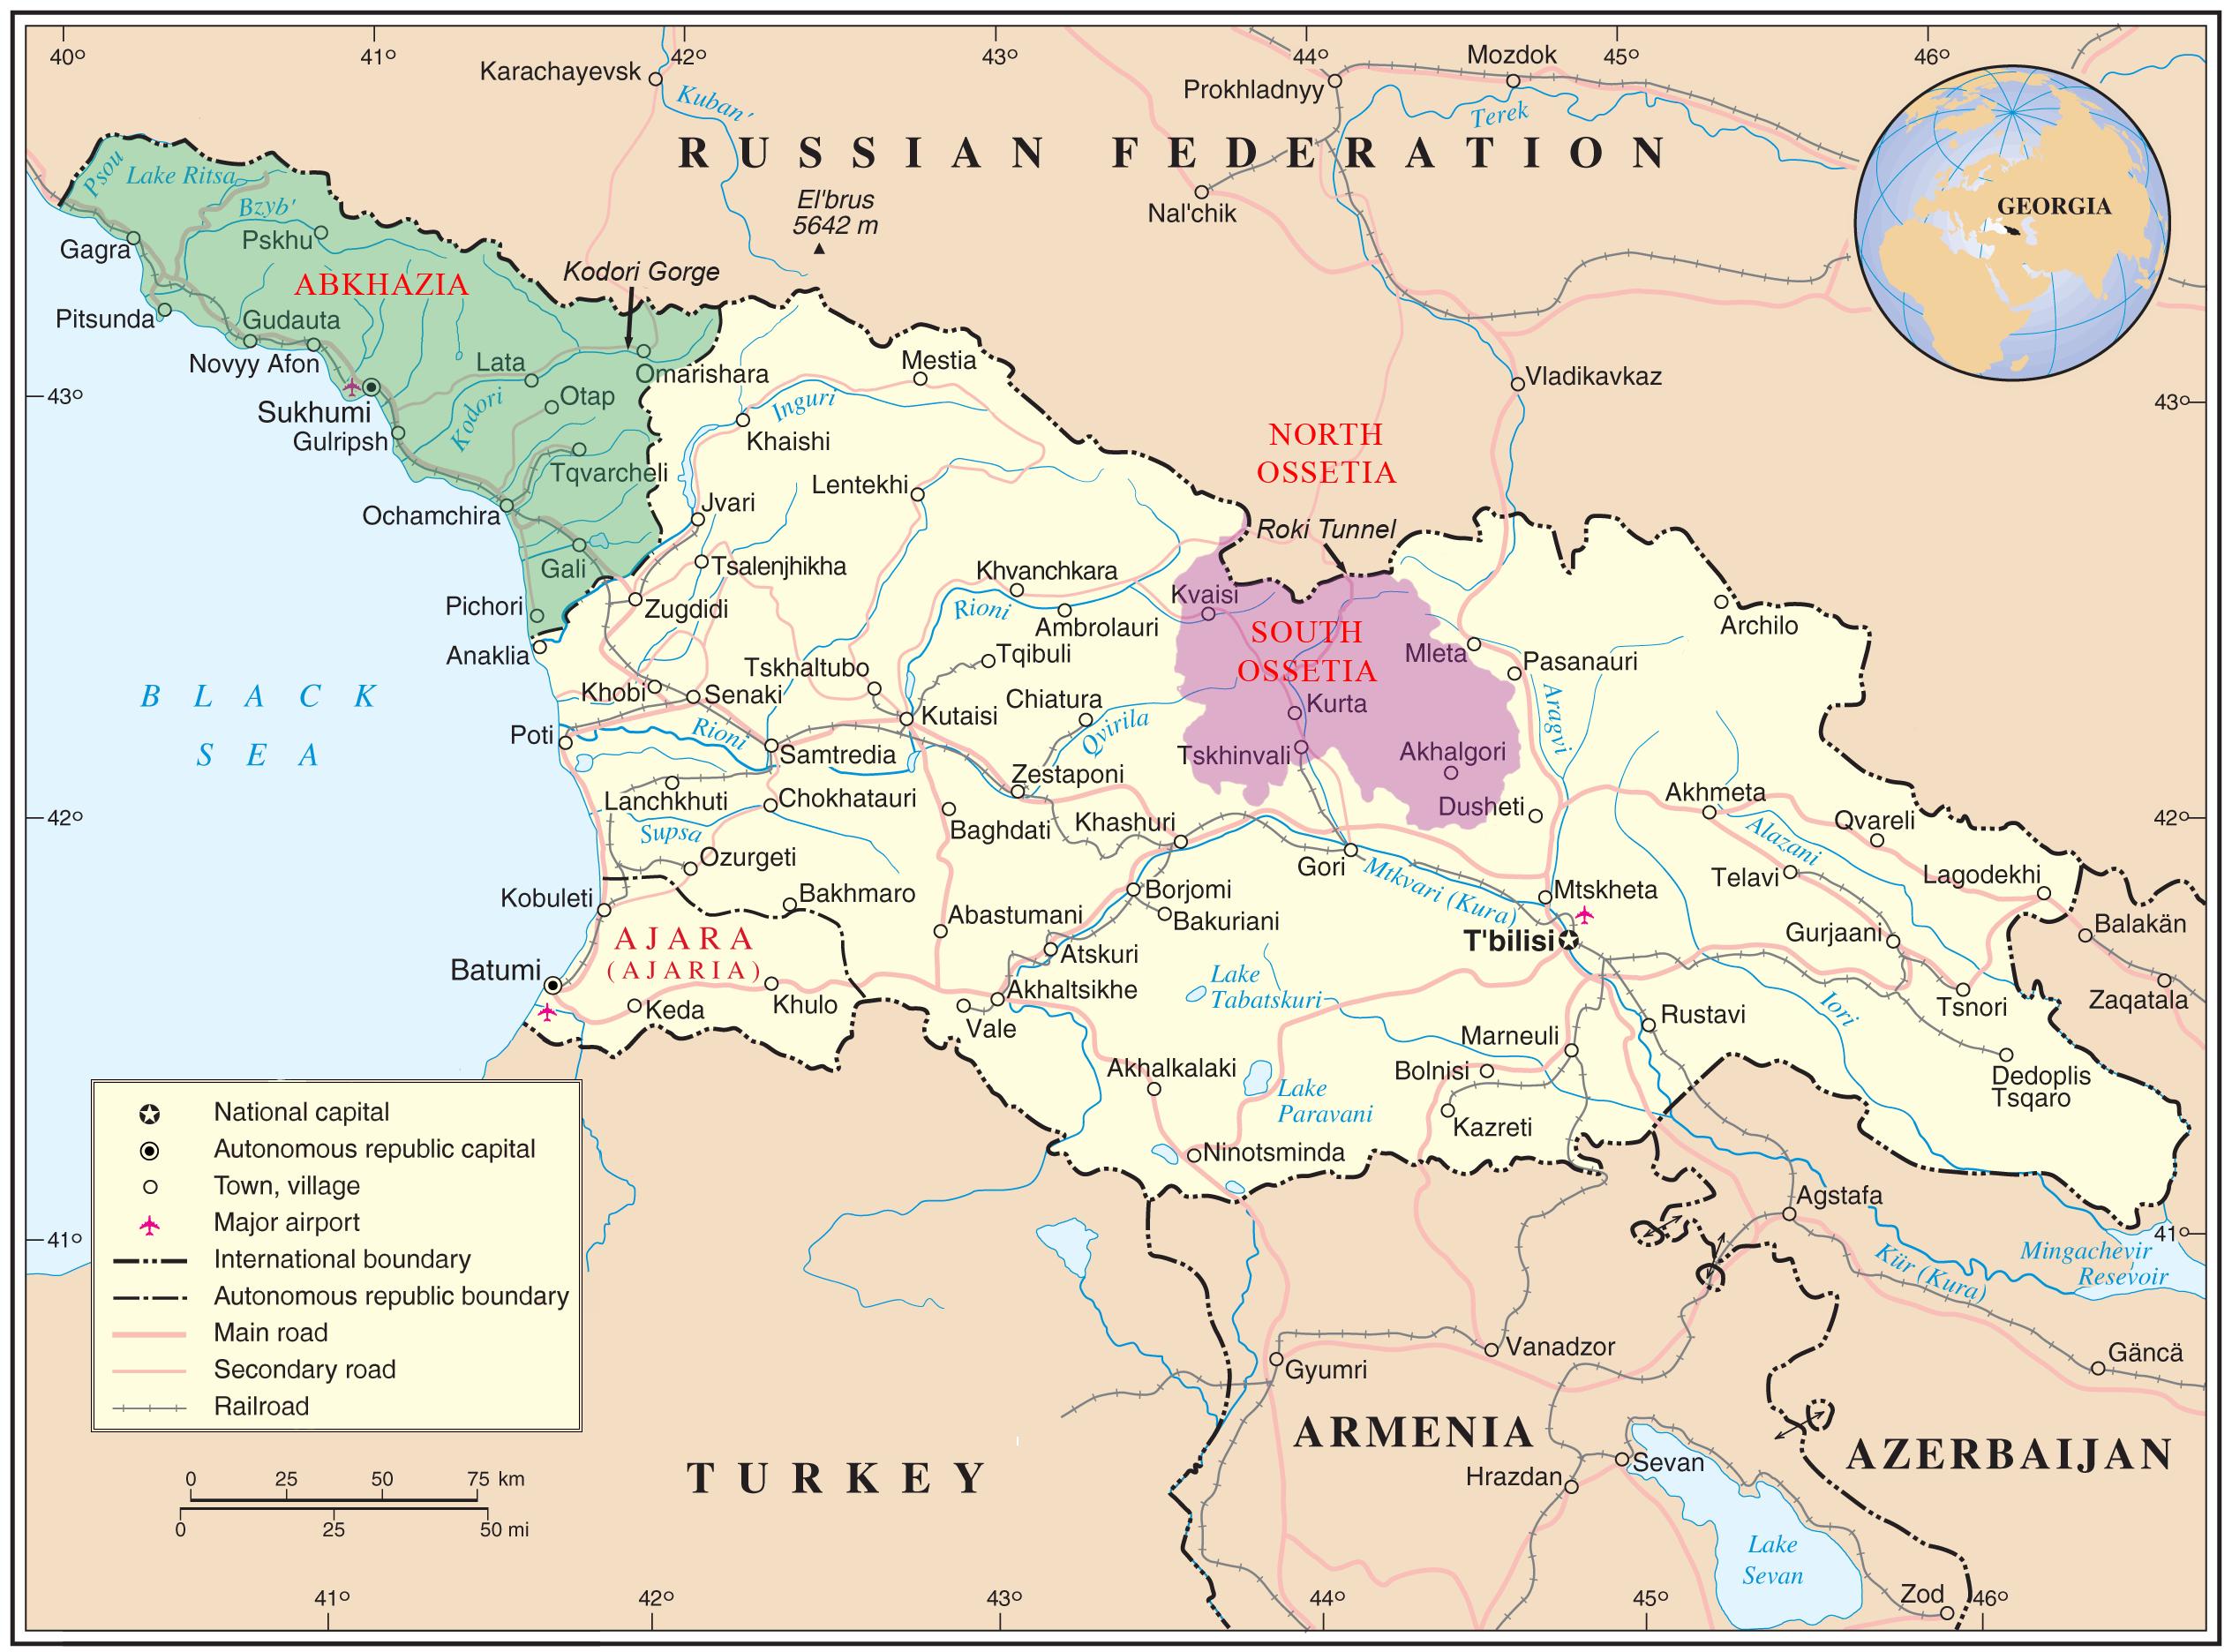 File:Georgia high detail map.png - Wikipedia